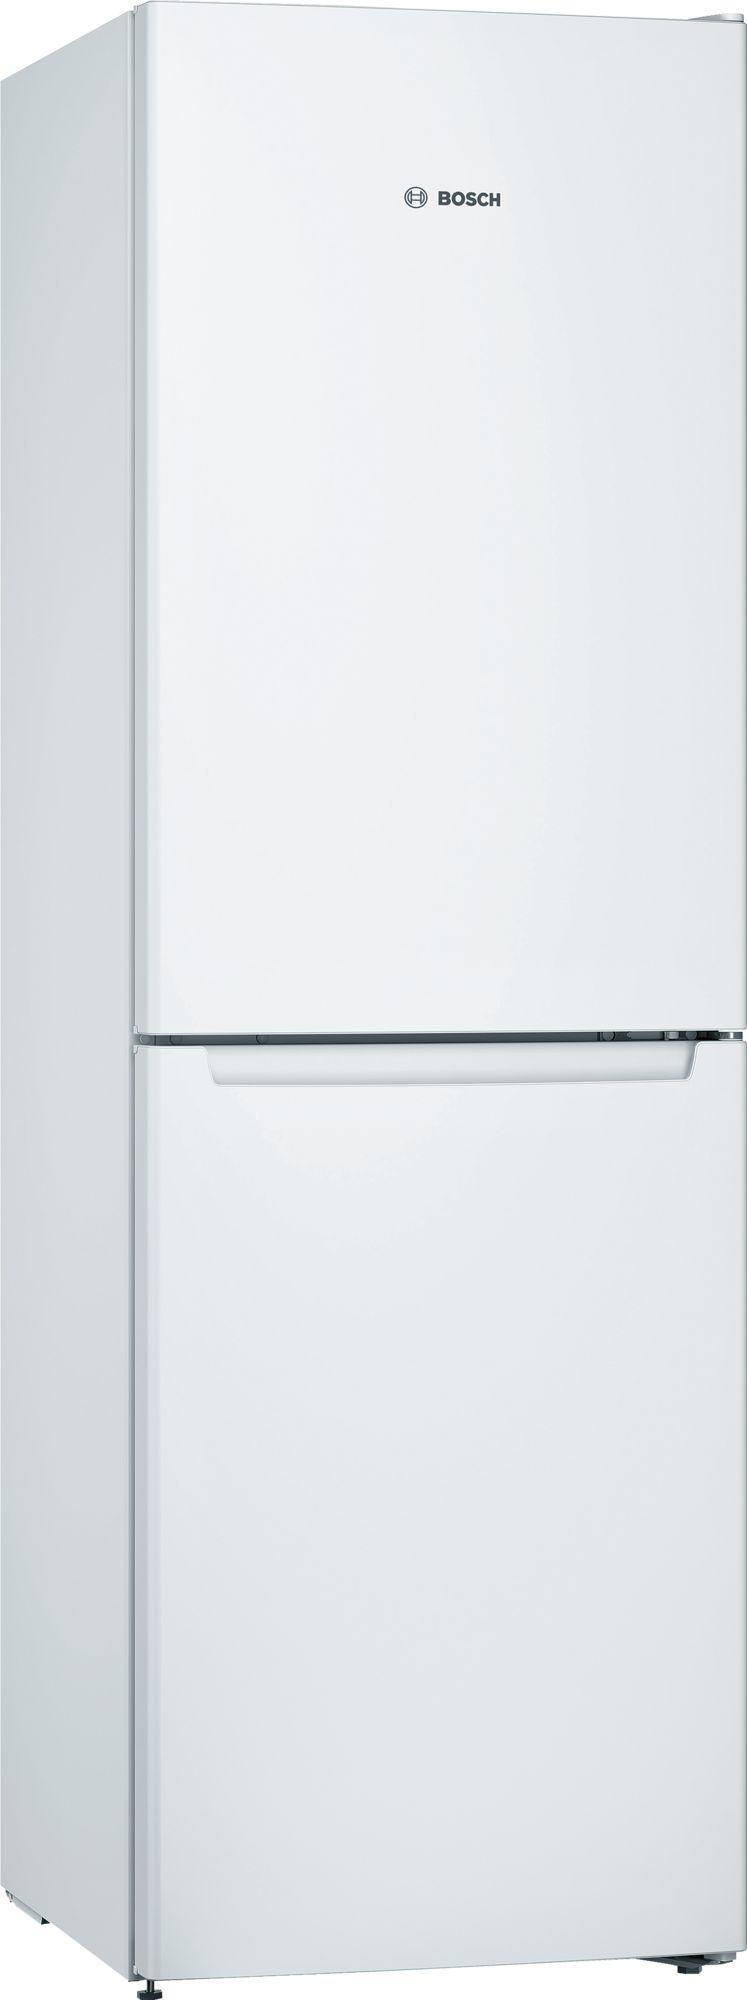 Image of Serie 2 KGN34NWEAG 60cm 297 Litre A++ Frost Free Fridge Freezer | White